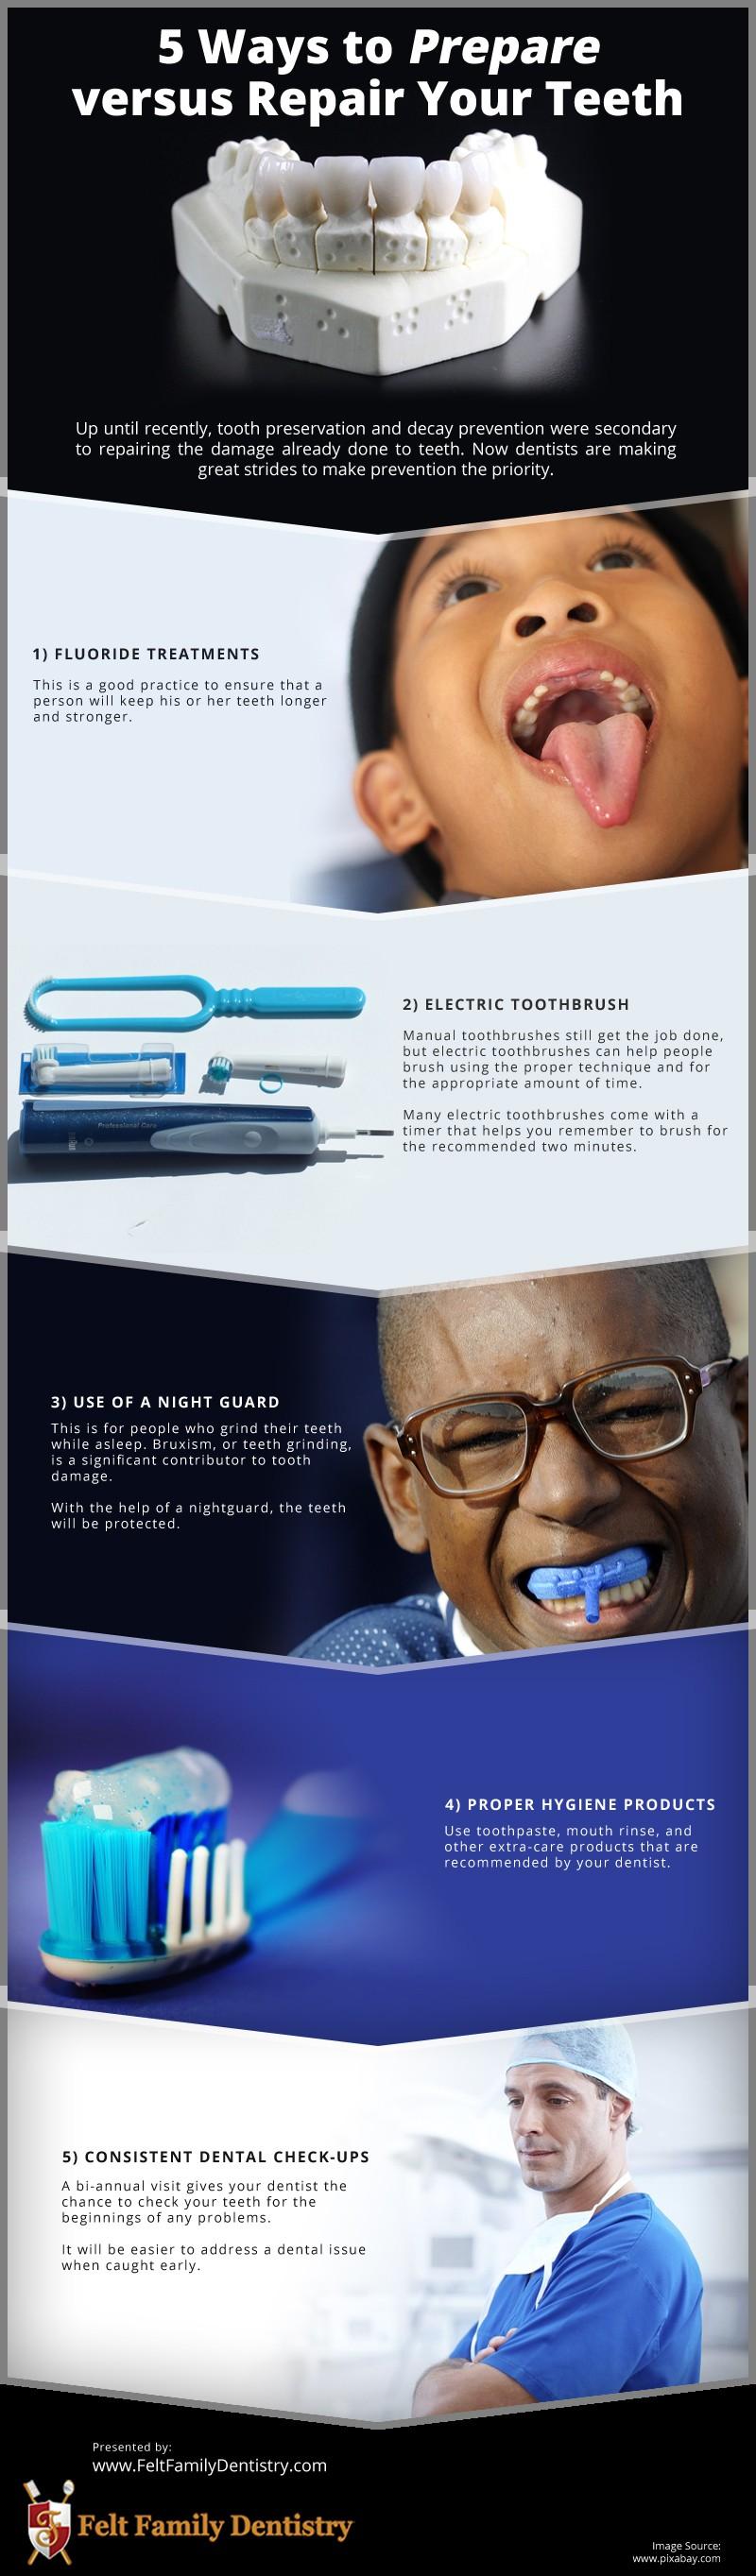 5 Ways to Prepare versus Repair Your Teeth [infographic]